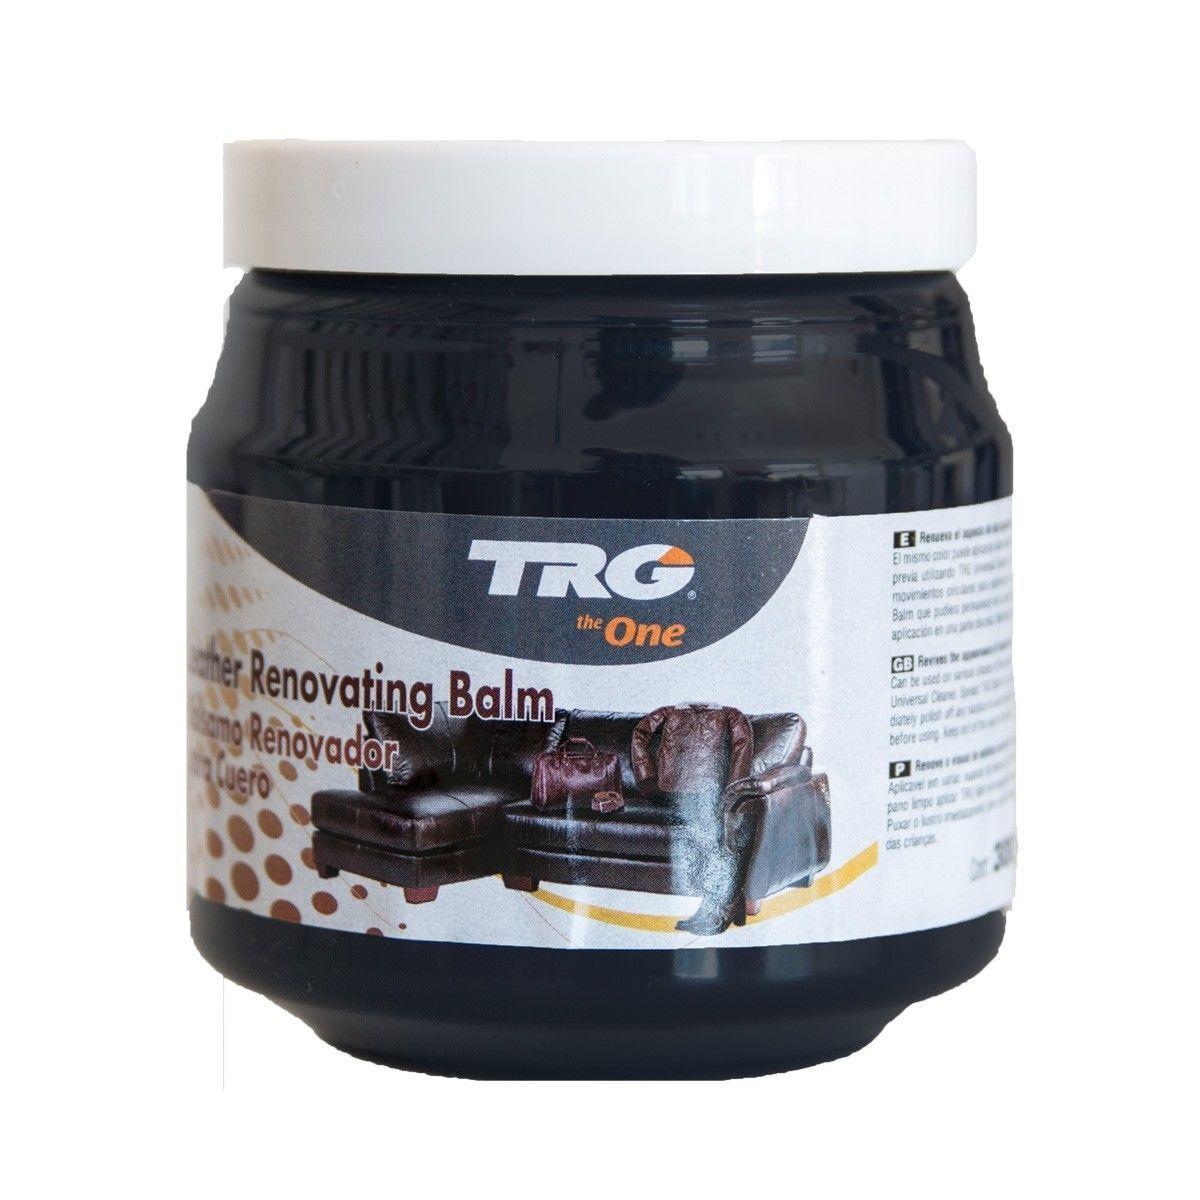 TRG Lederbalsam Farbe schwarz 300 ml - Lederpflege - Schuhcreme - Lederfarbe